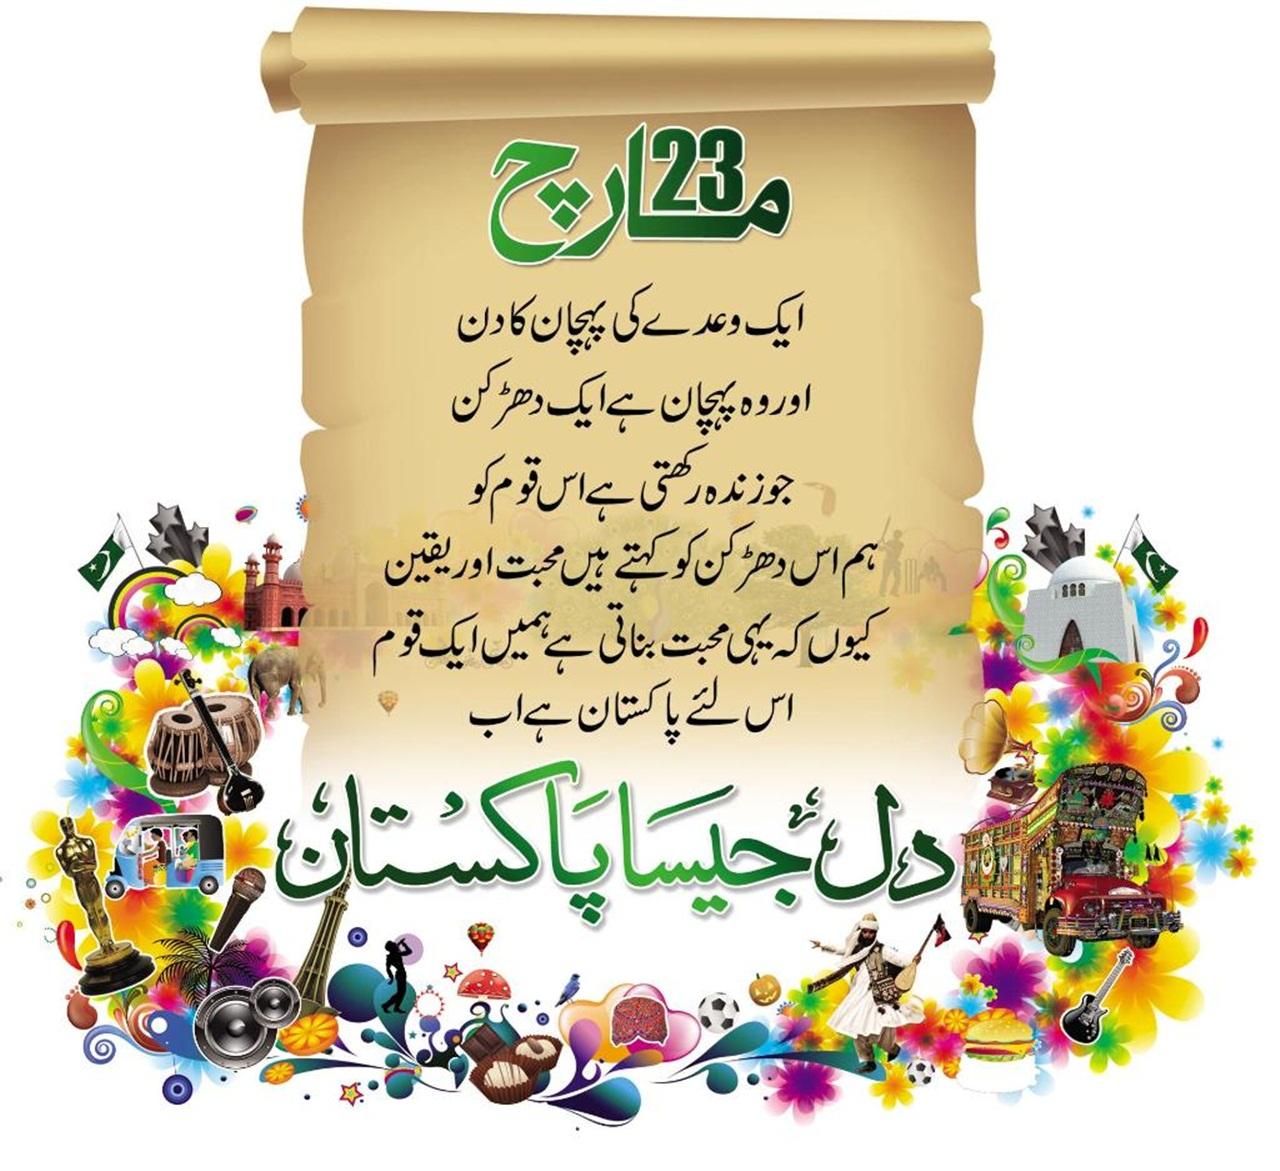 Pakistan Day 2015 Wallpapers  23rd March Youm E Pakistan